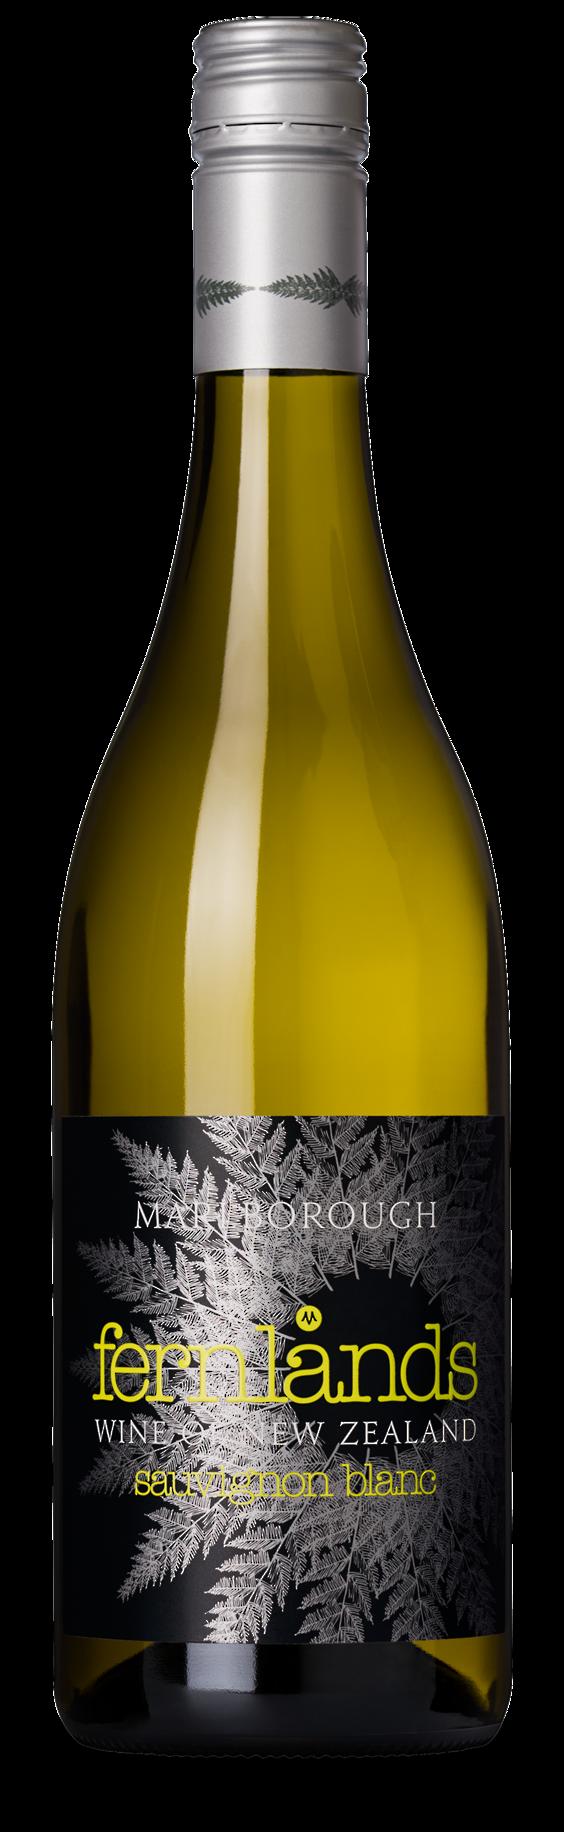 Fernlands Sauvignon Blanc 2020 image 0